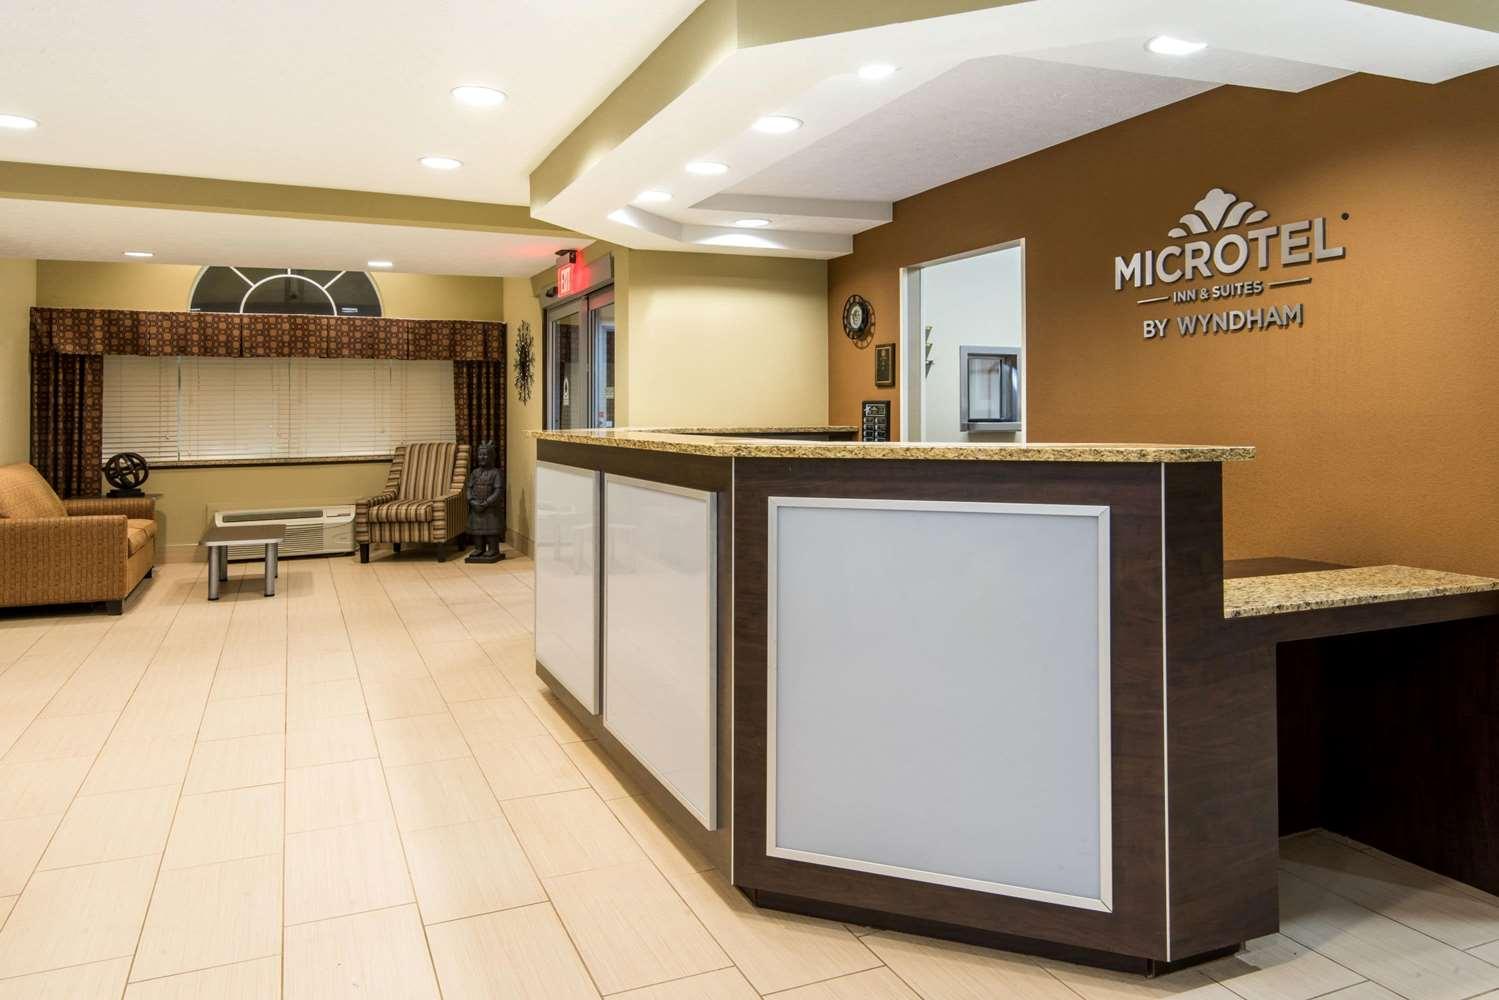 Lobby - Microtel Inn & Suites by Wyndham North Canton